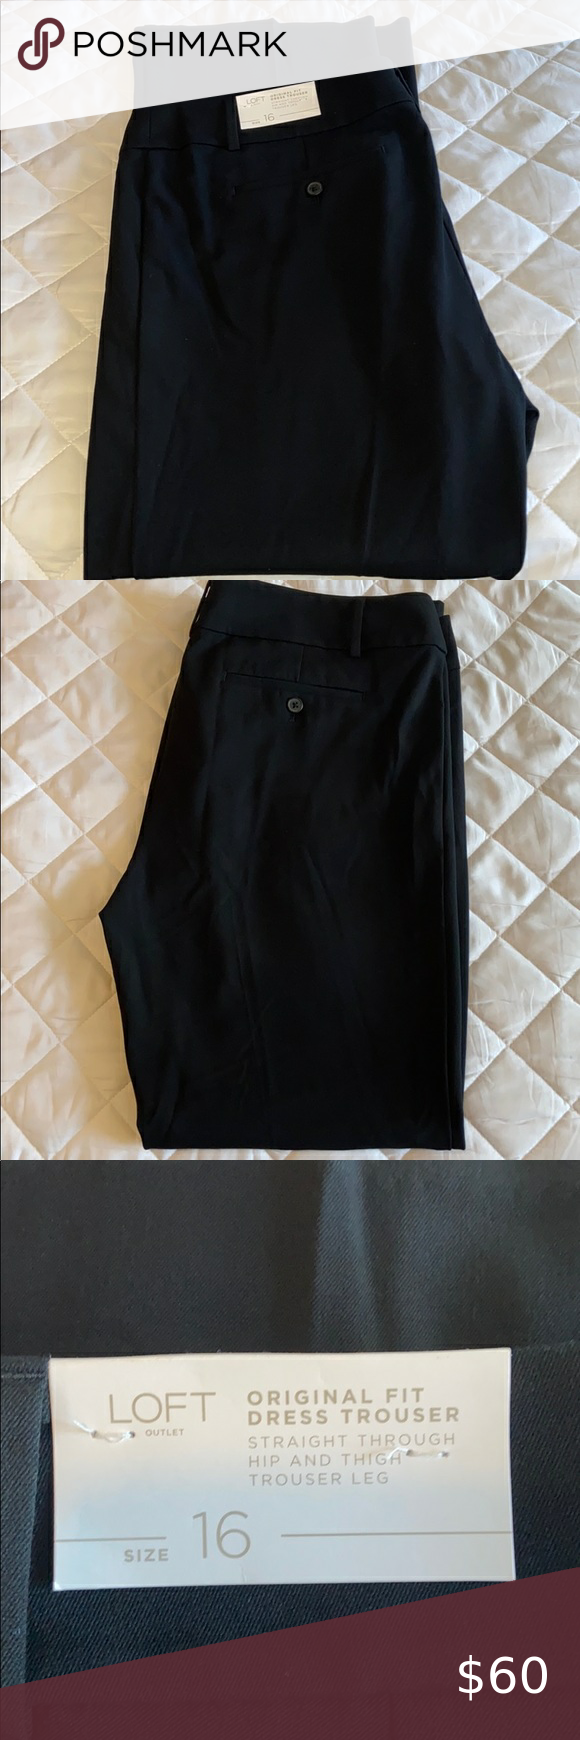 Loft Black Dress Work Pants Size 16 Dresses For Work Black Dress Black Dress Pants [ 1740 x 580 Pixel ]